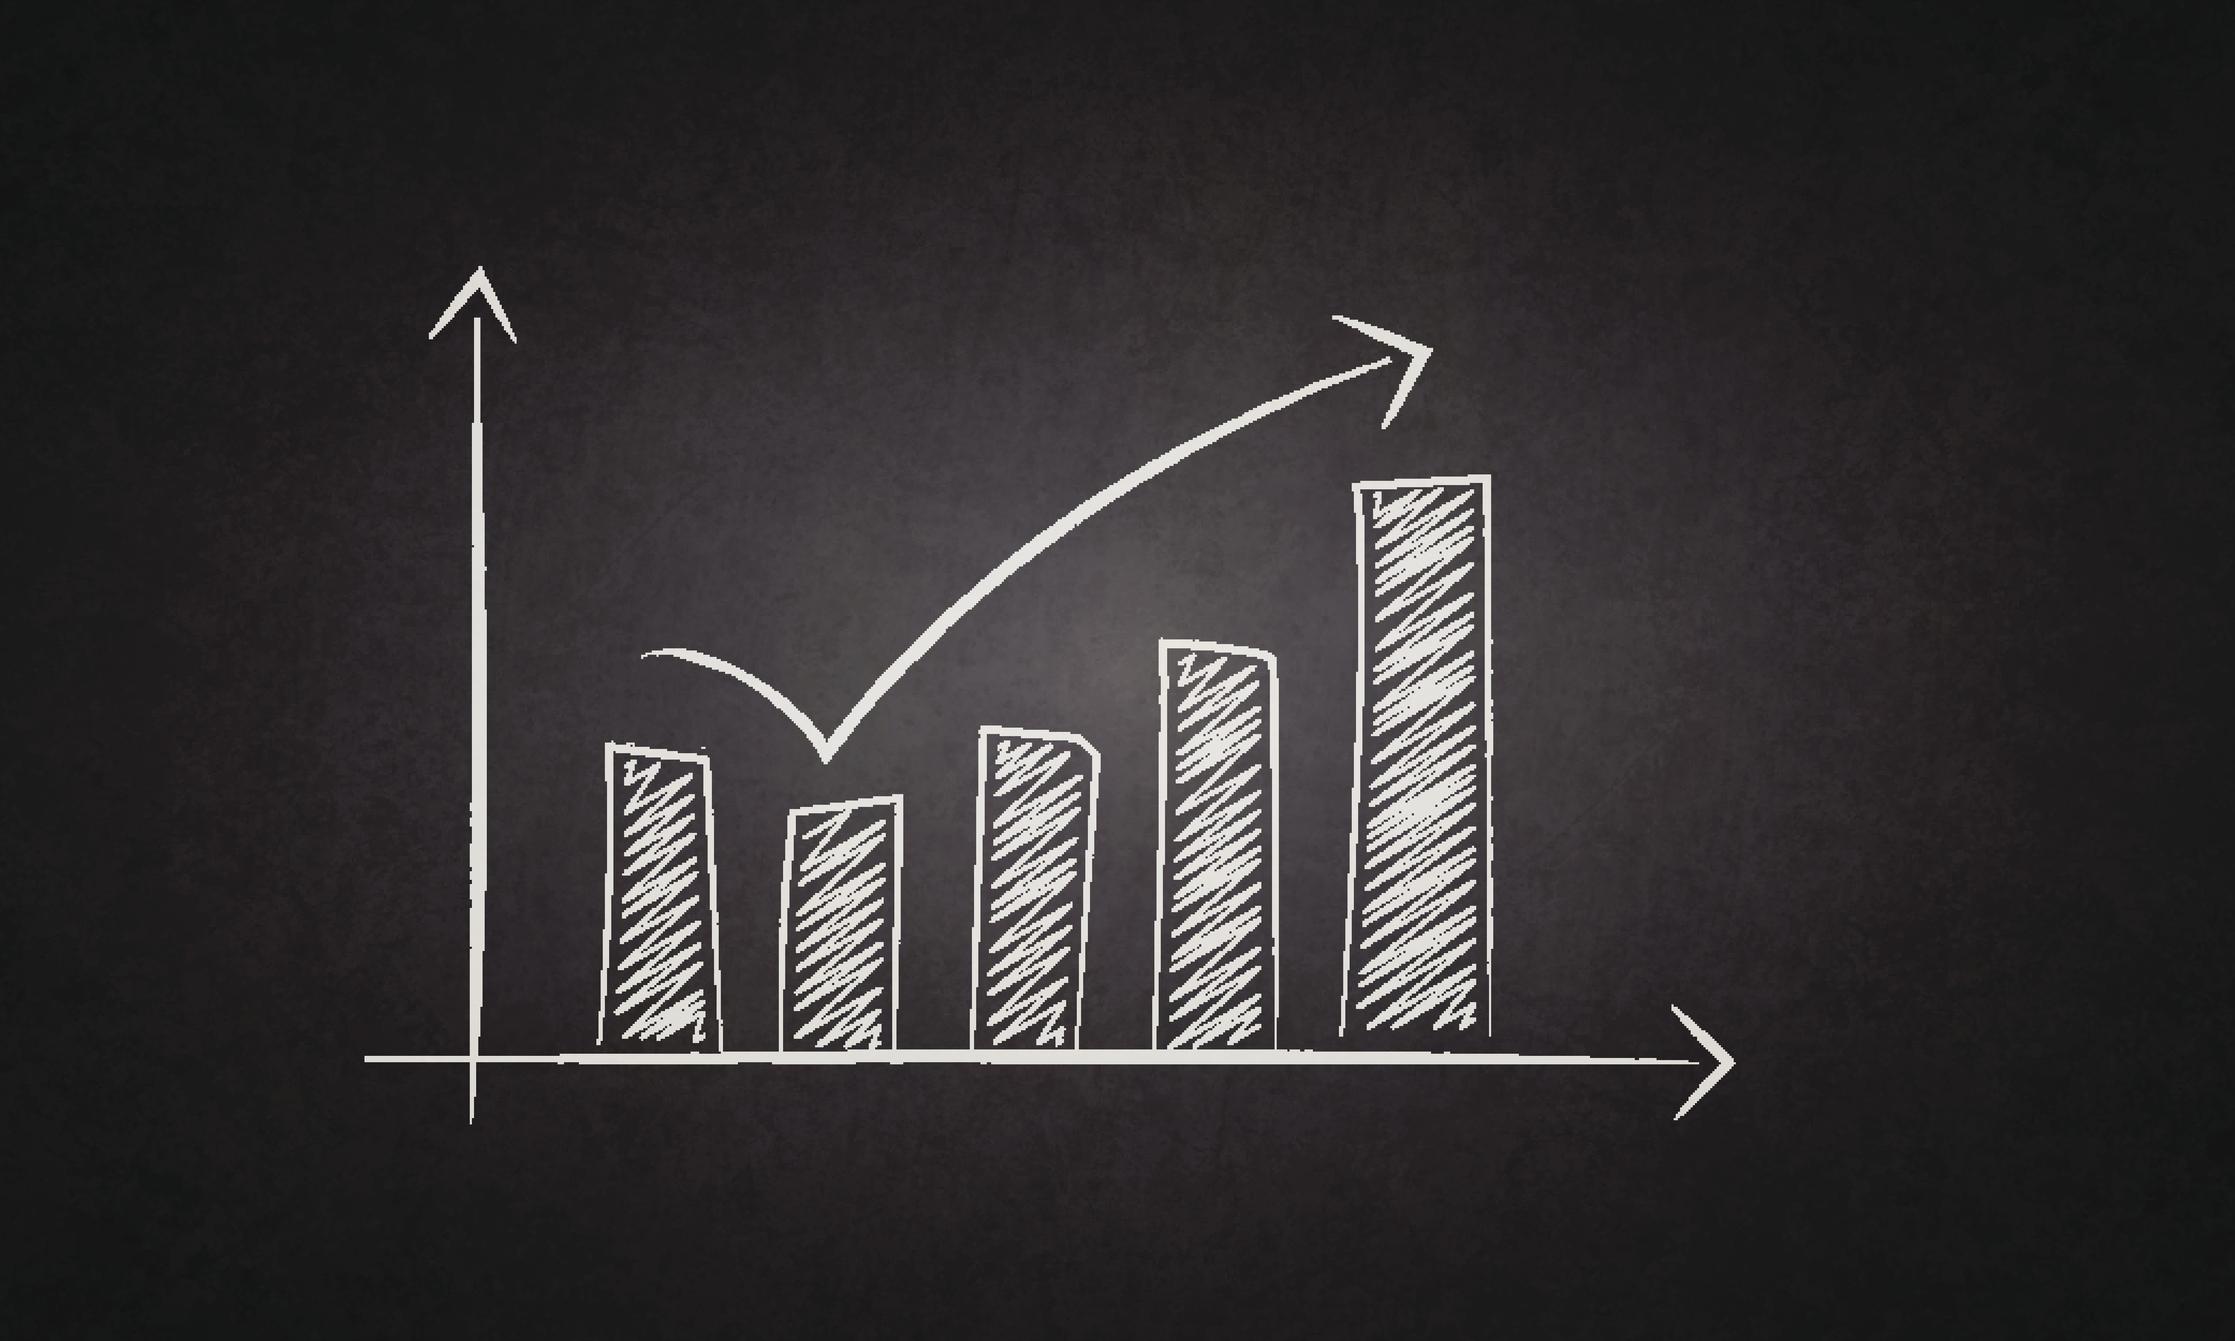 A bar chart drawn on a chalkboard showing growth.